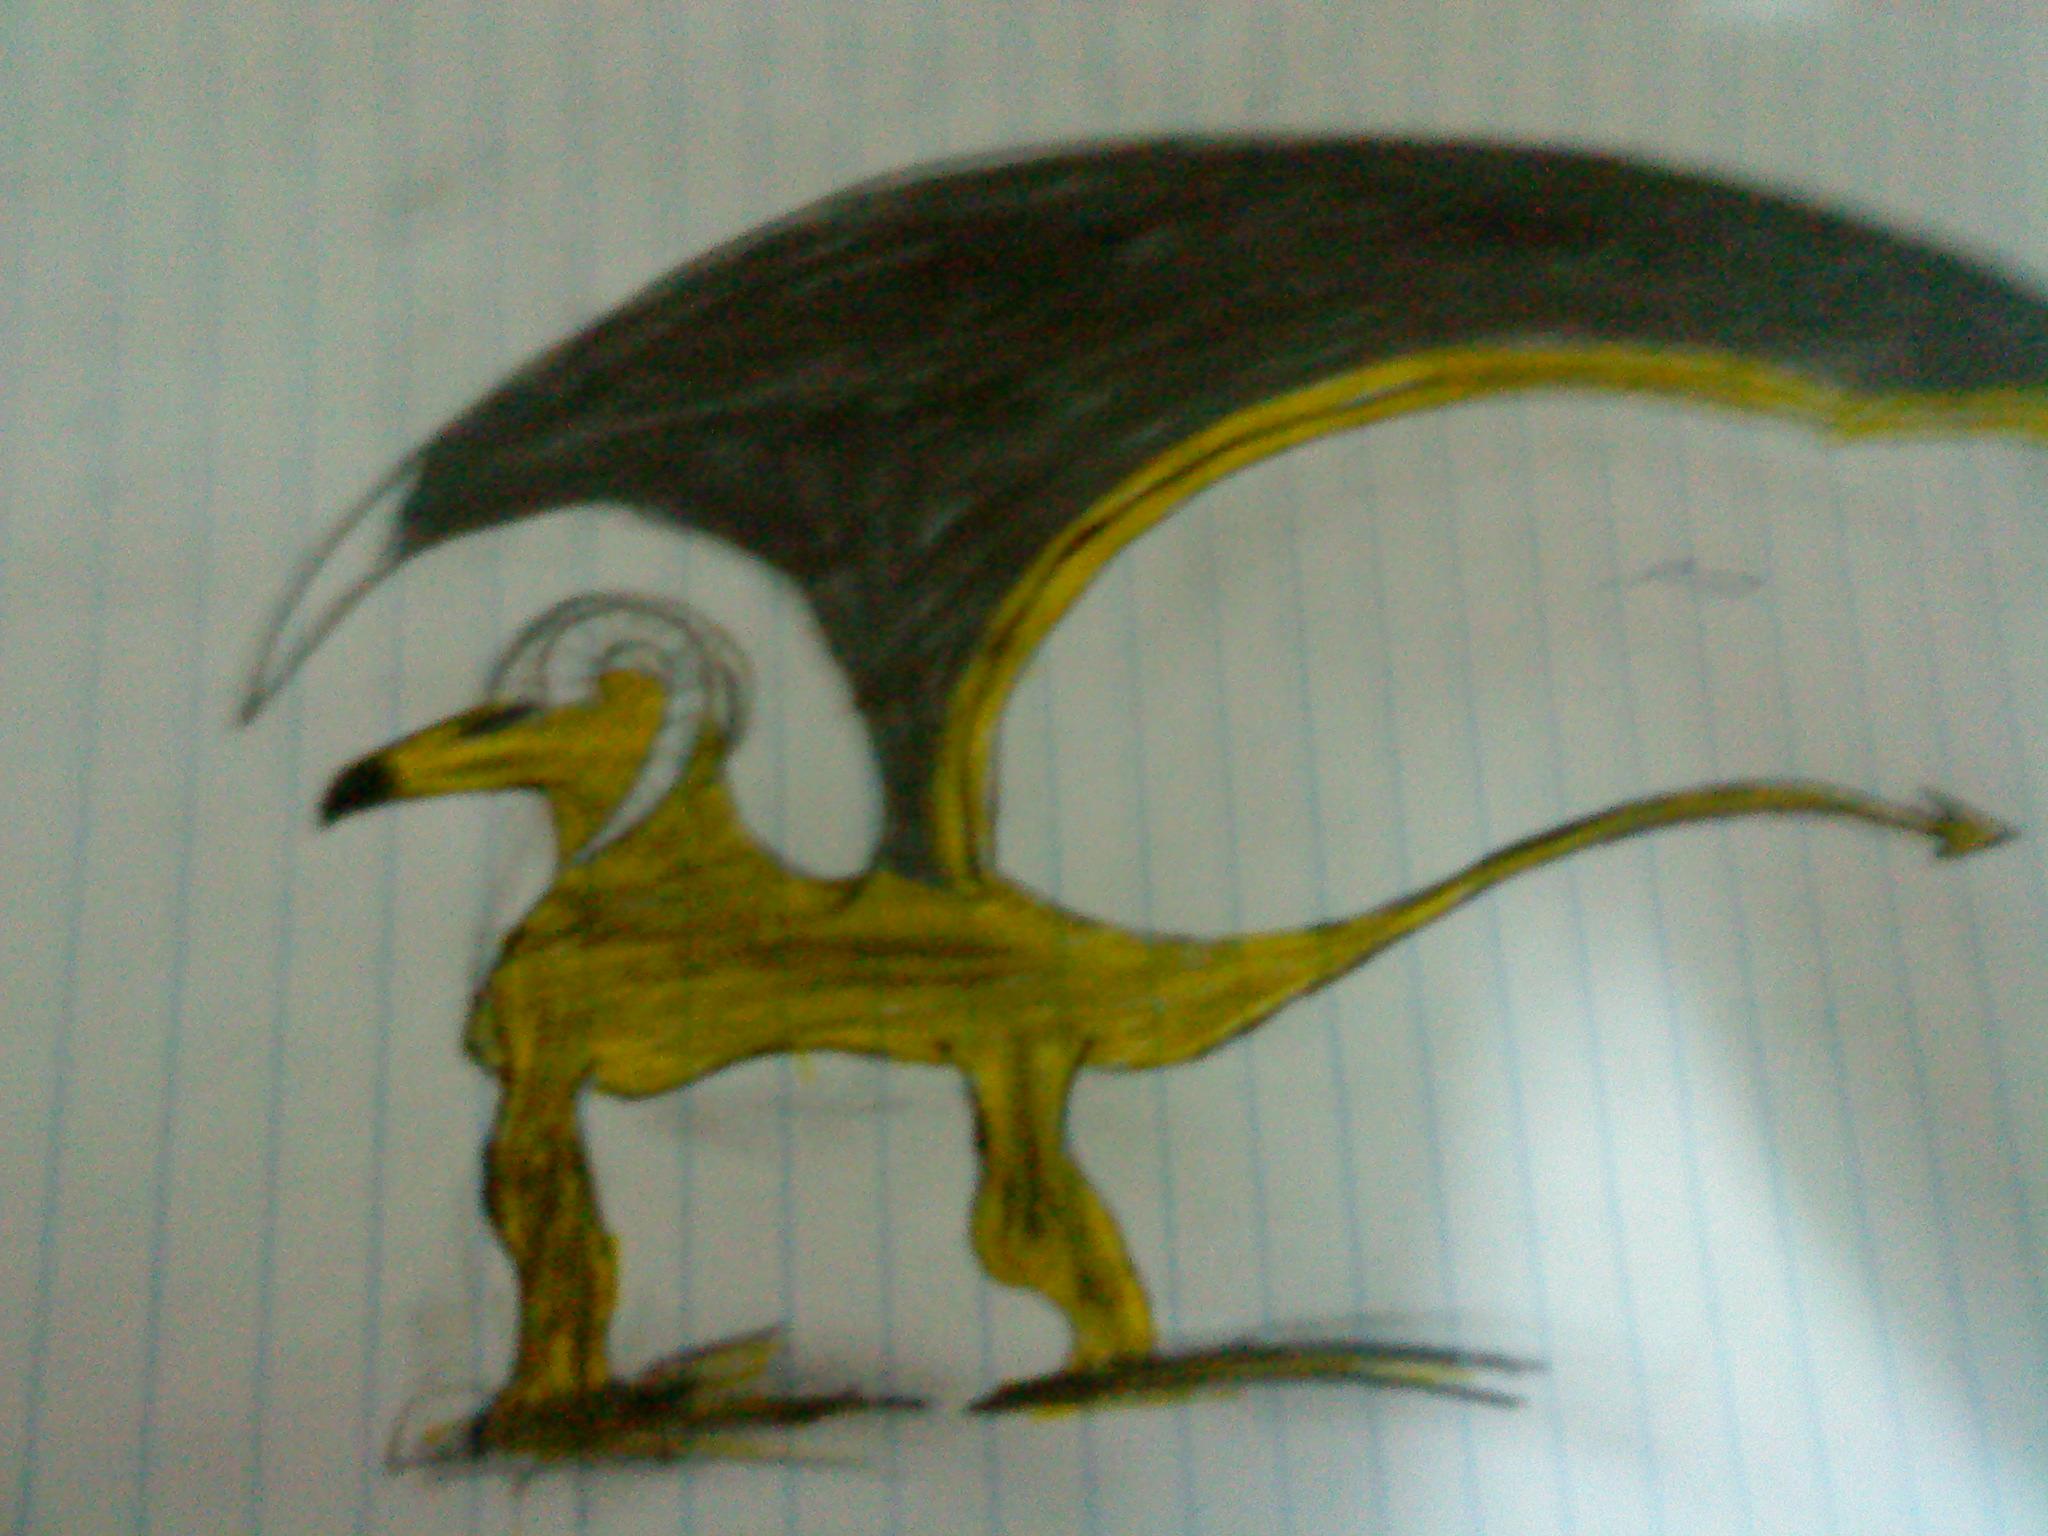 badly drawn griphon